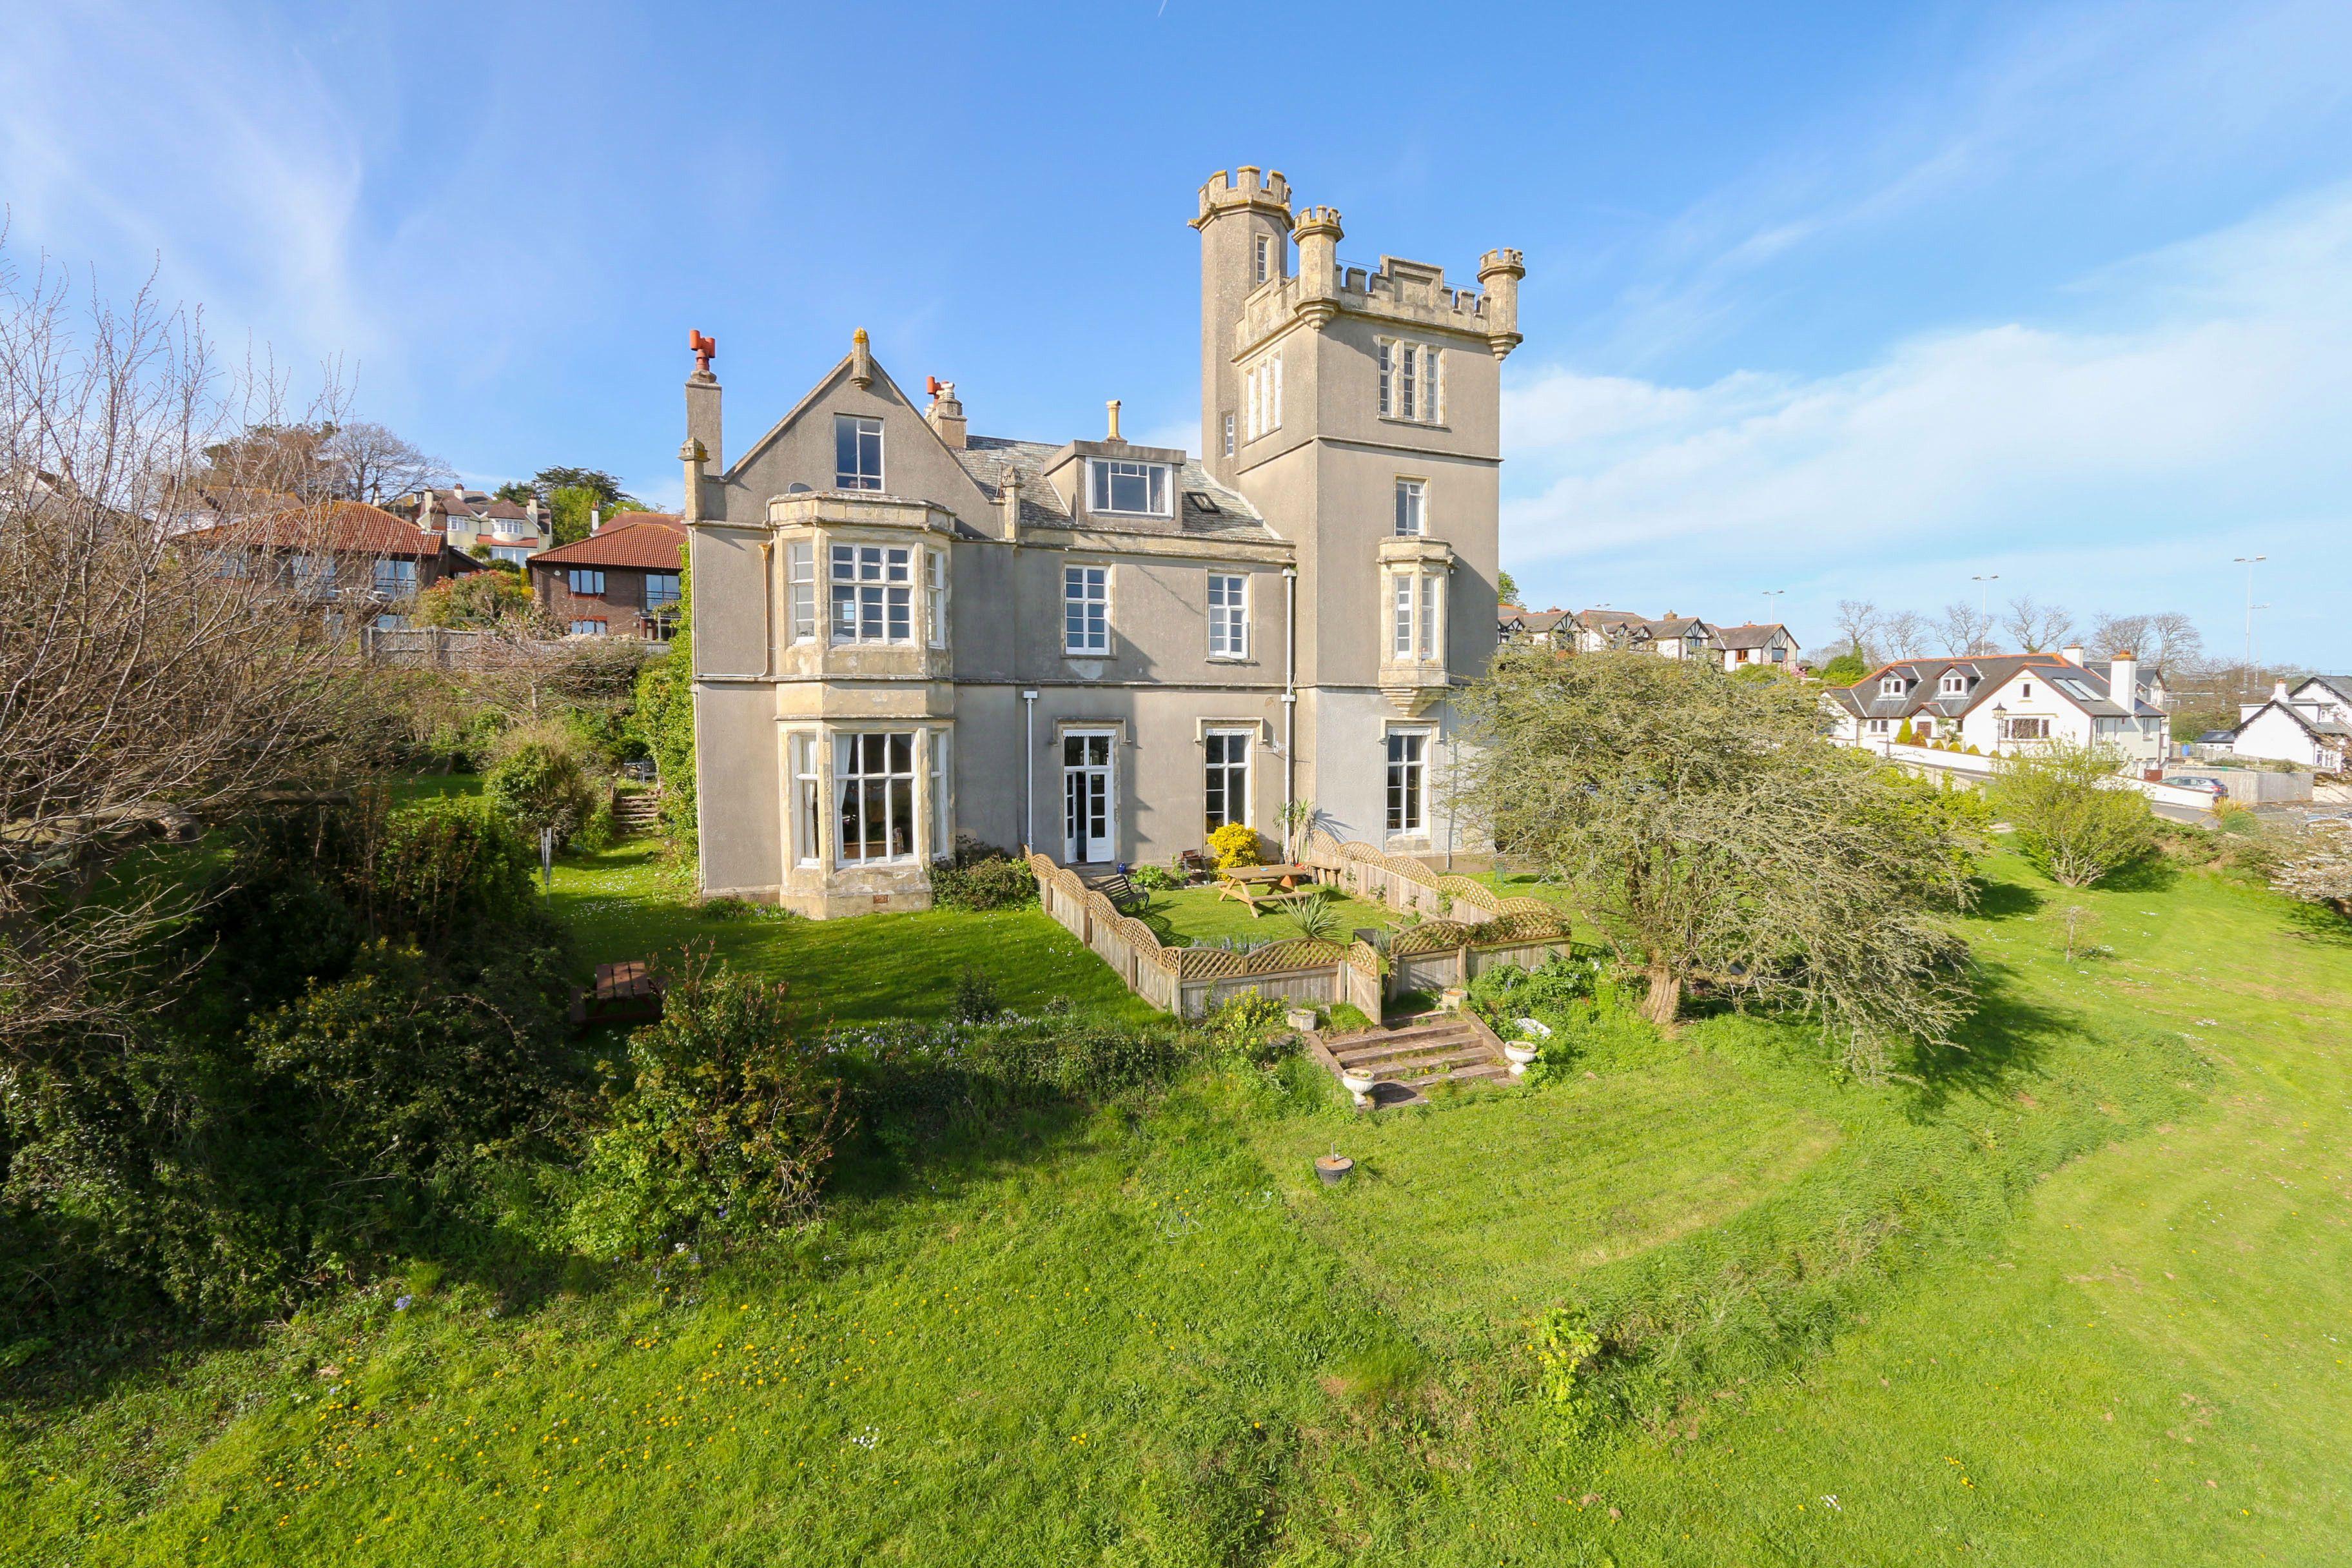 Victorian Gothic 'Fairytale' Castle/ Folly in Devon, England